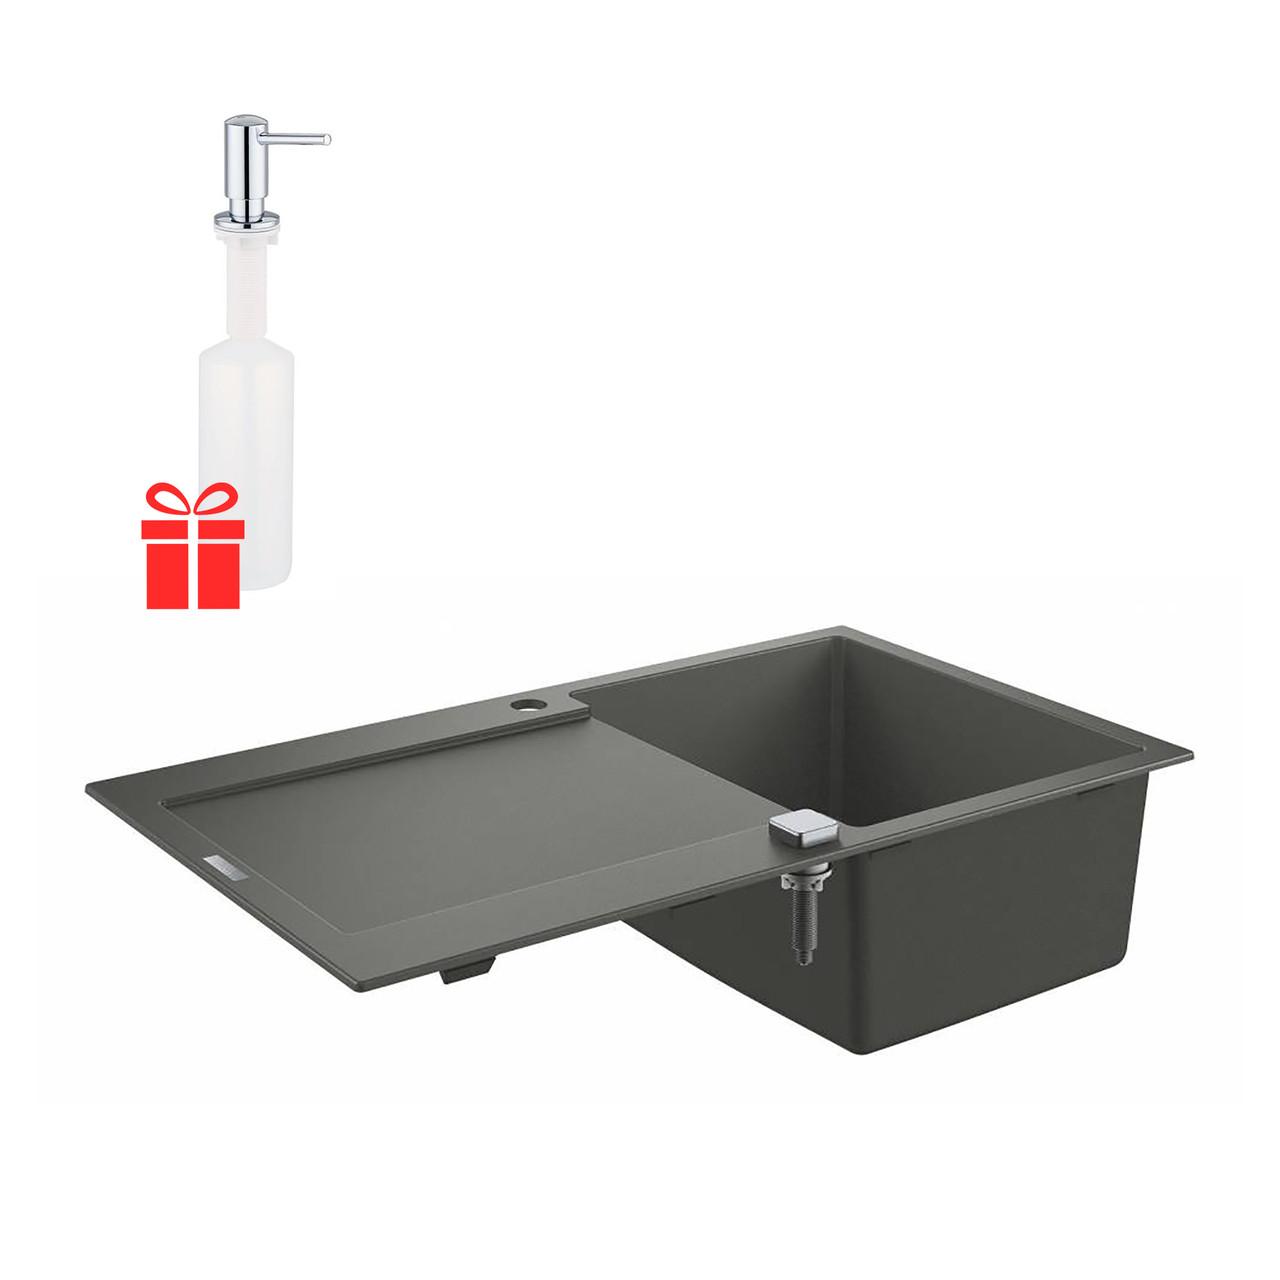 Набір Grohe мийка кухонна K500 31644AT0 + дозатор для миючого засобу Contemporary 40536000